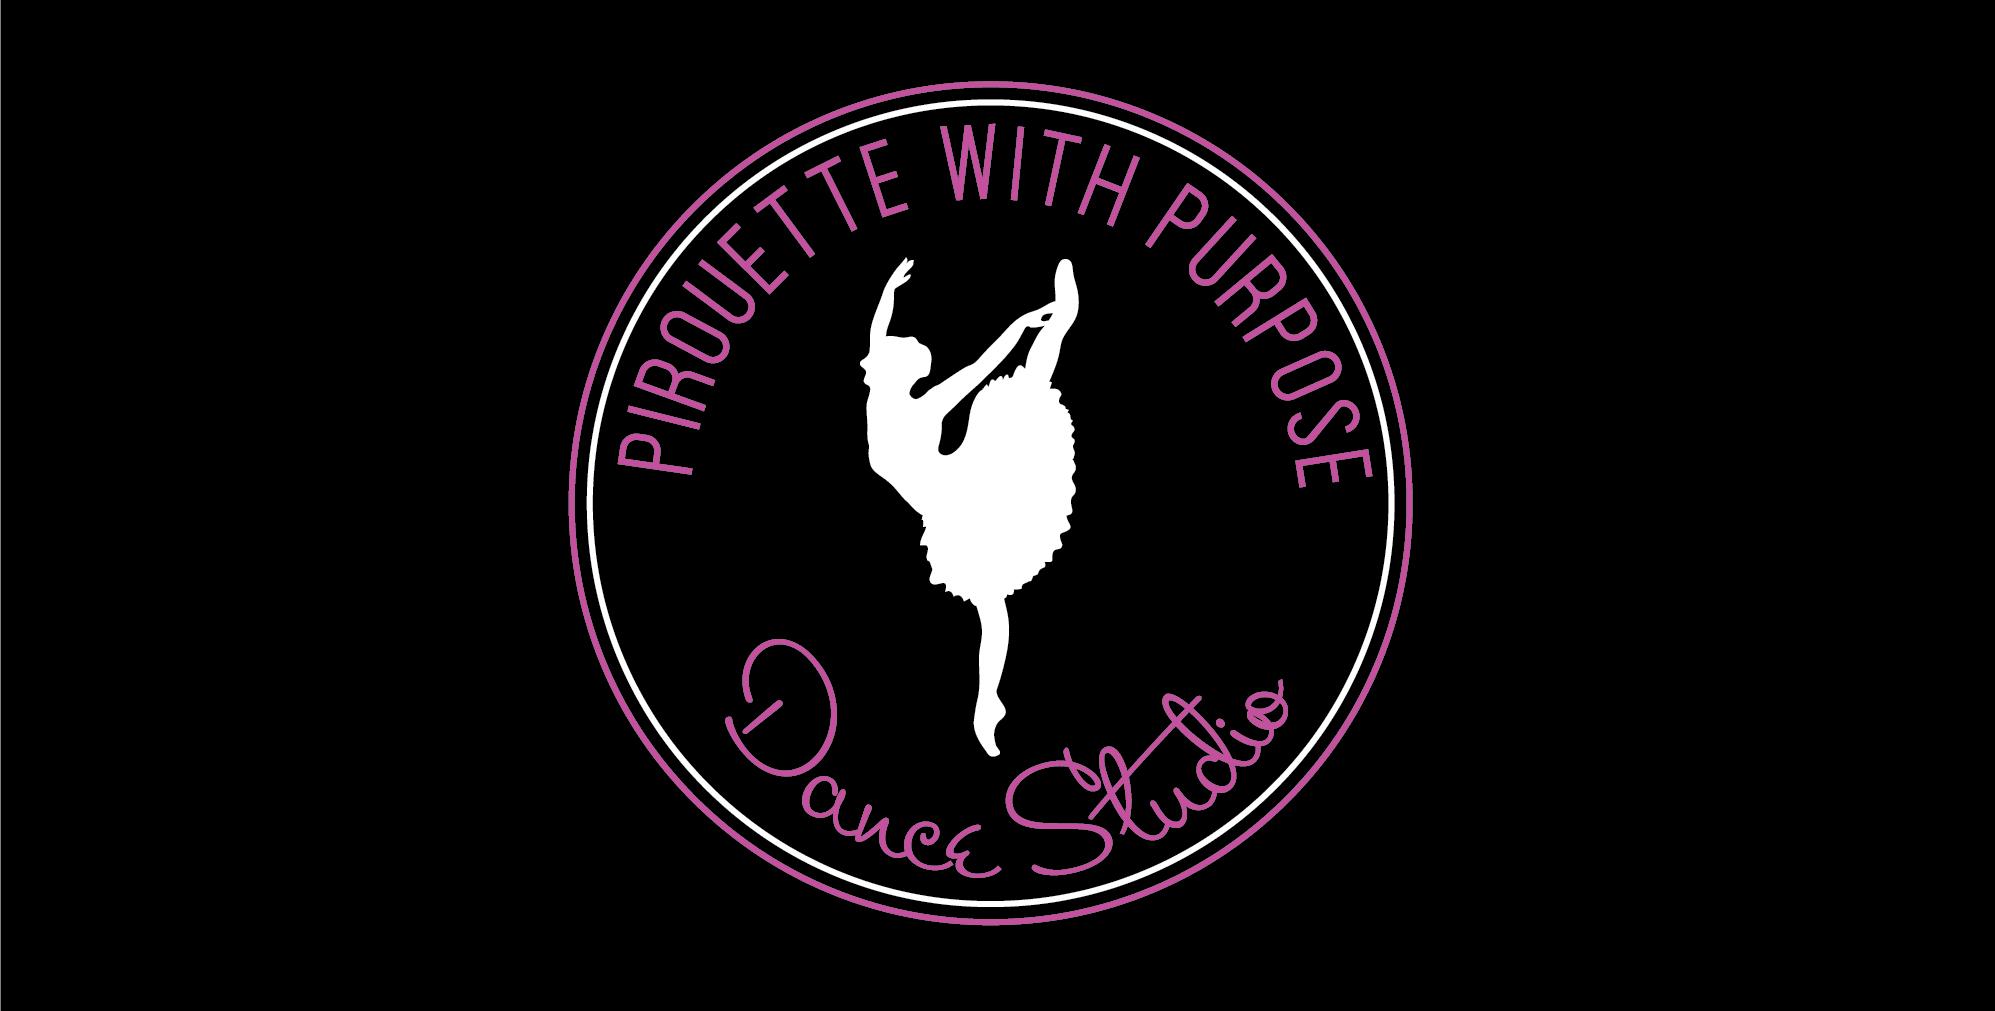 Pirouette With Purpose Dance Studio